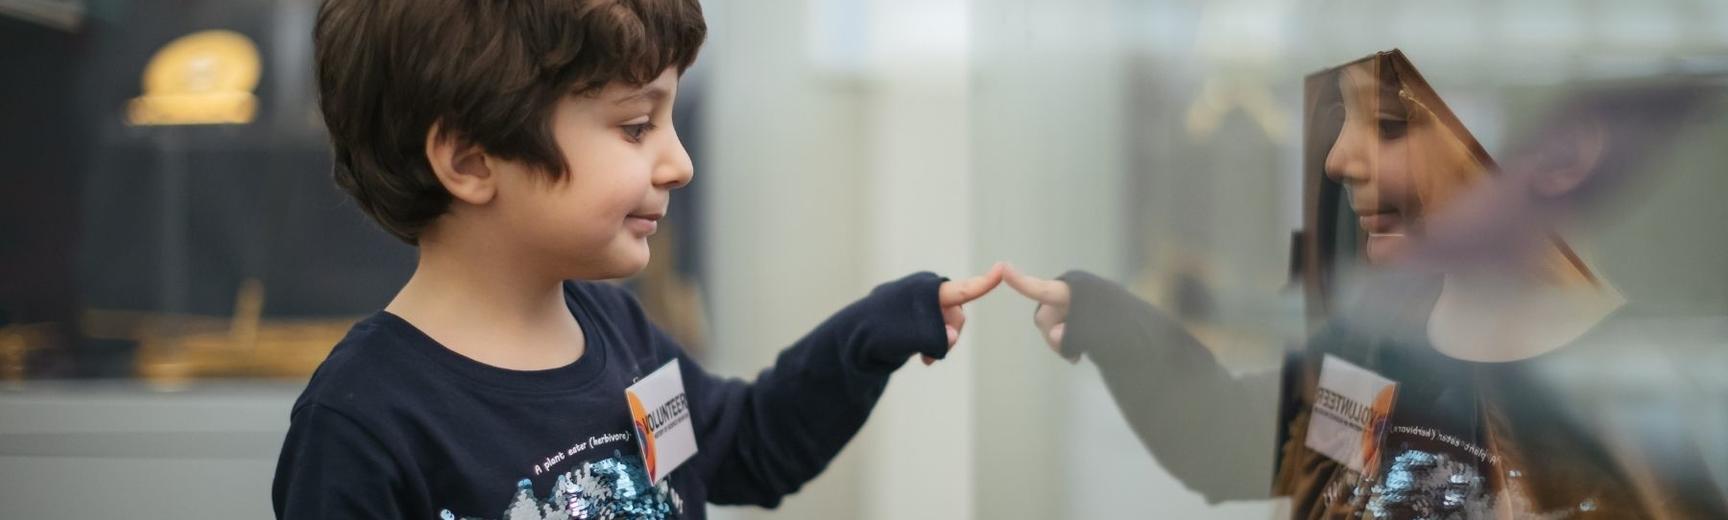 Young Multaka volunteer explores the History of Science Museum